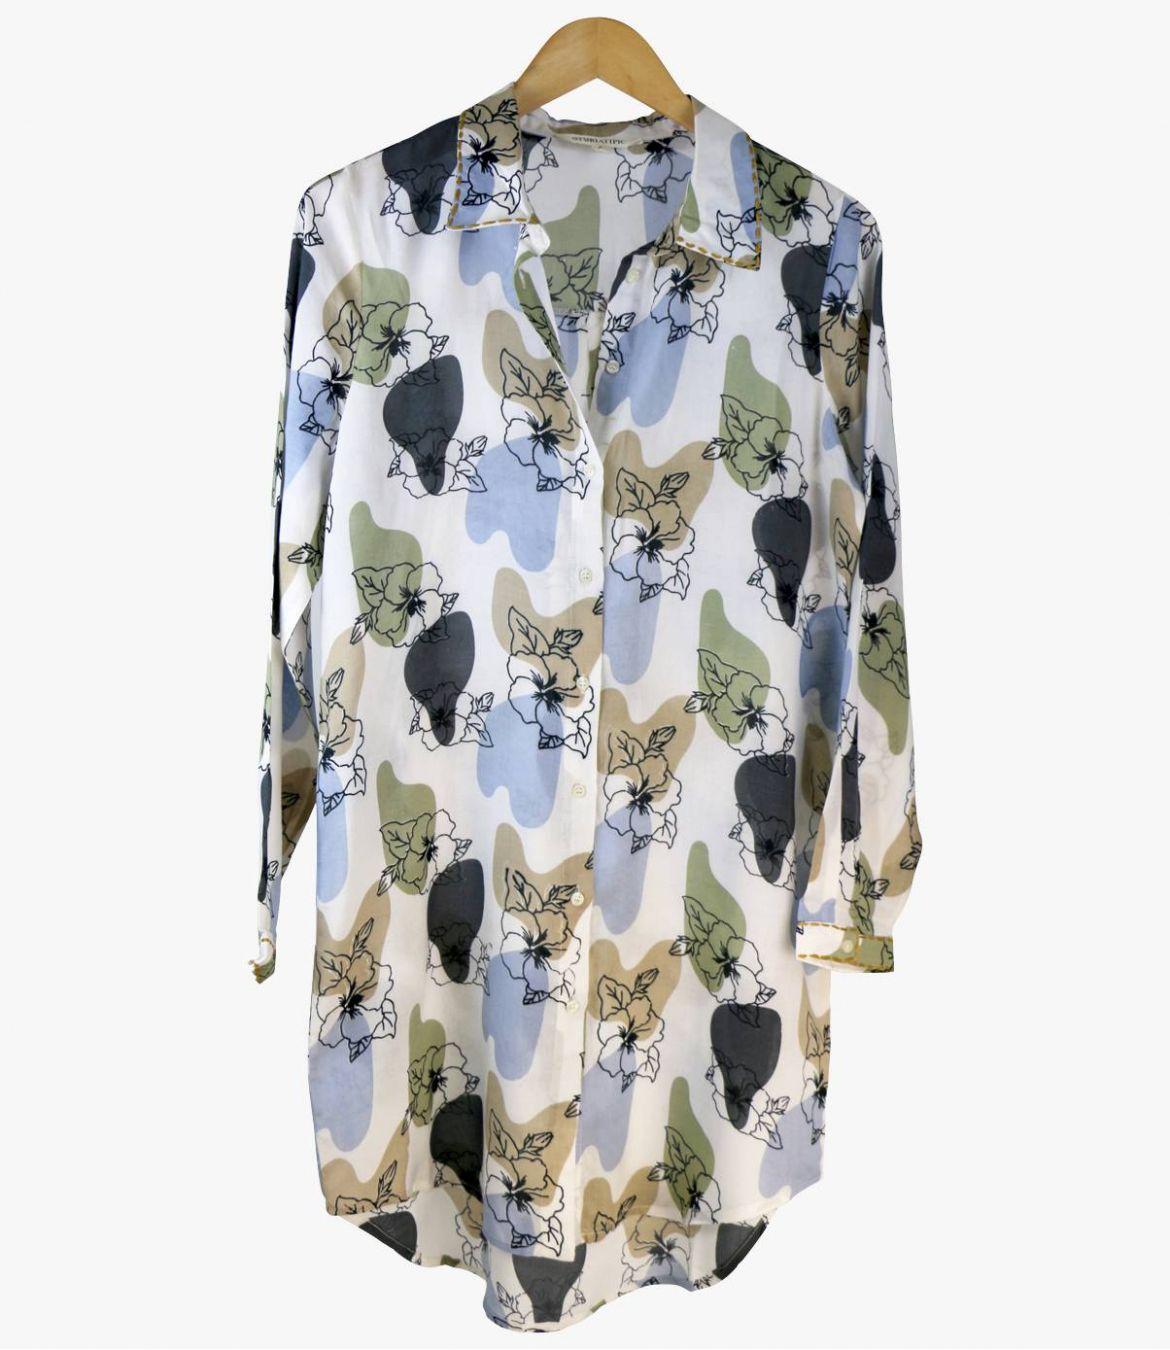 KAIA VANYA Women's Modal Dress Storiatipic - 1